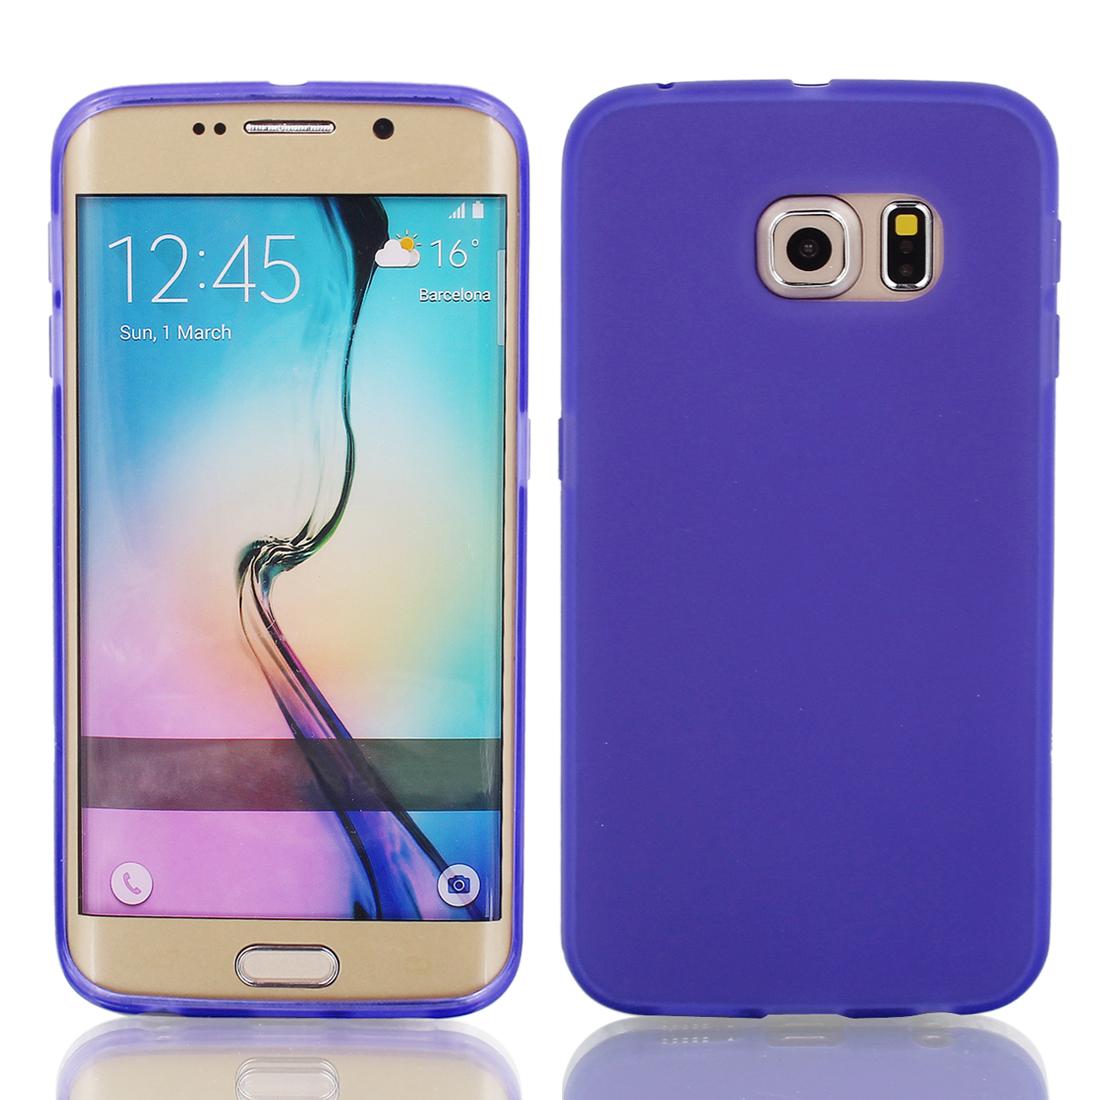 Purple Silicone Back Case Cover w Protective Film Wiper for S6/G925